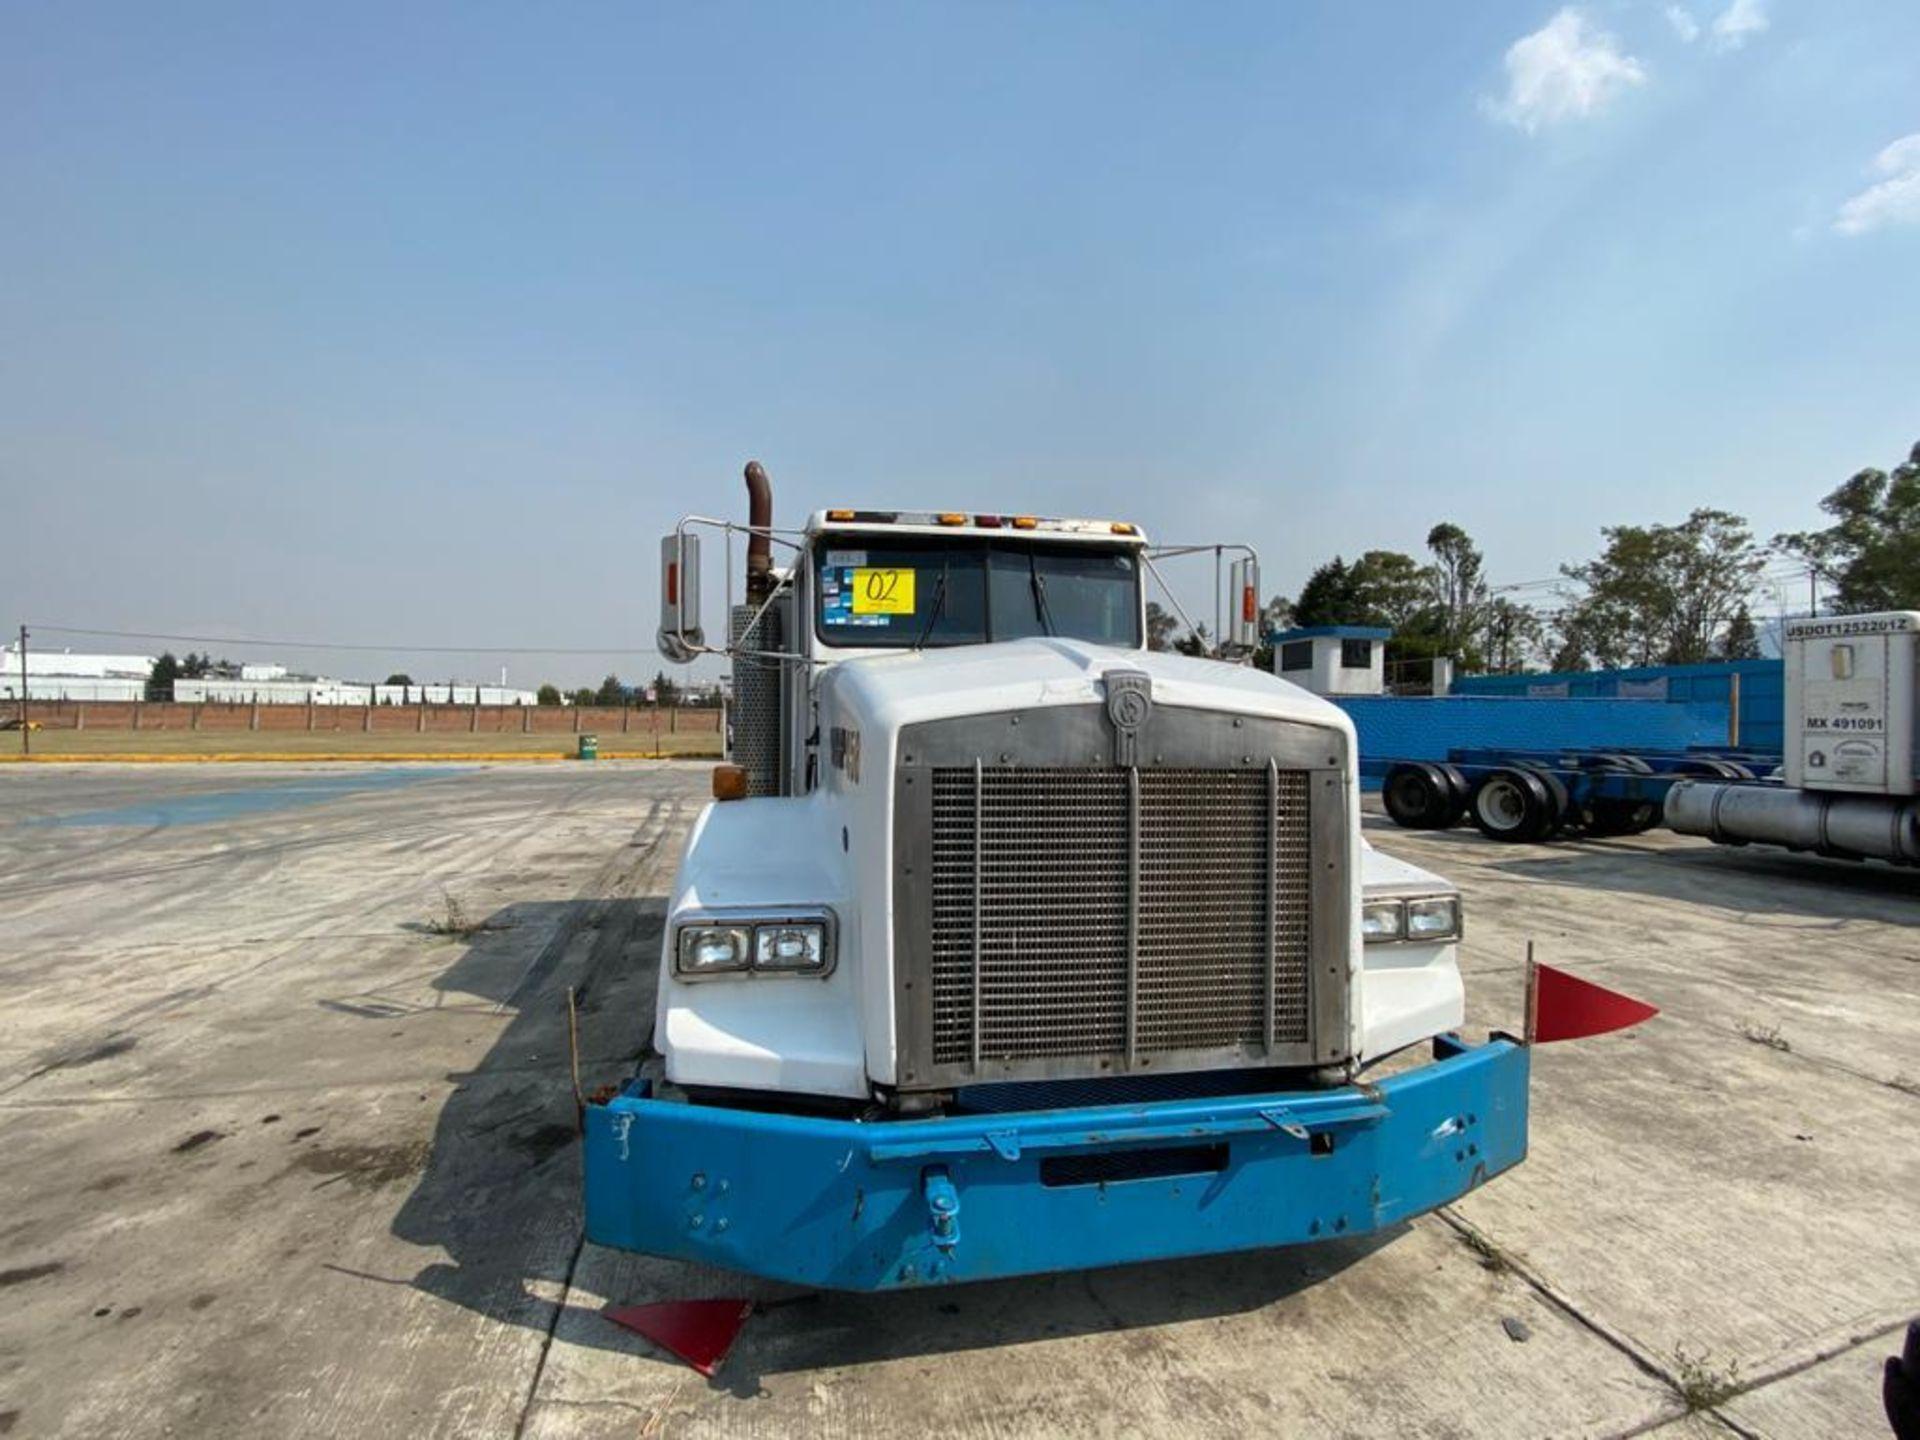 1999 Kenworth Sleeper truck tractor, standard transmission of 18 speeds - Image 4 of 75